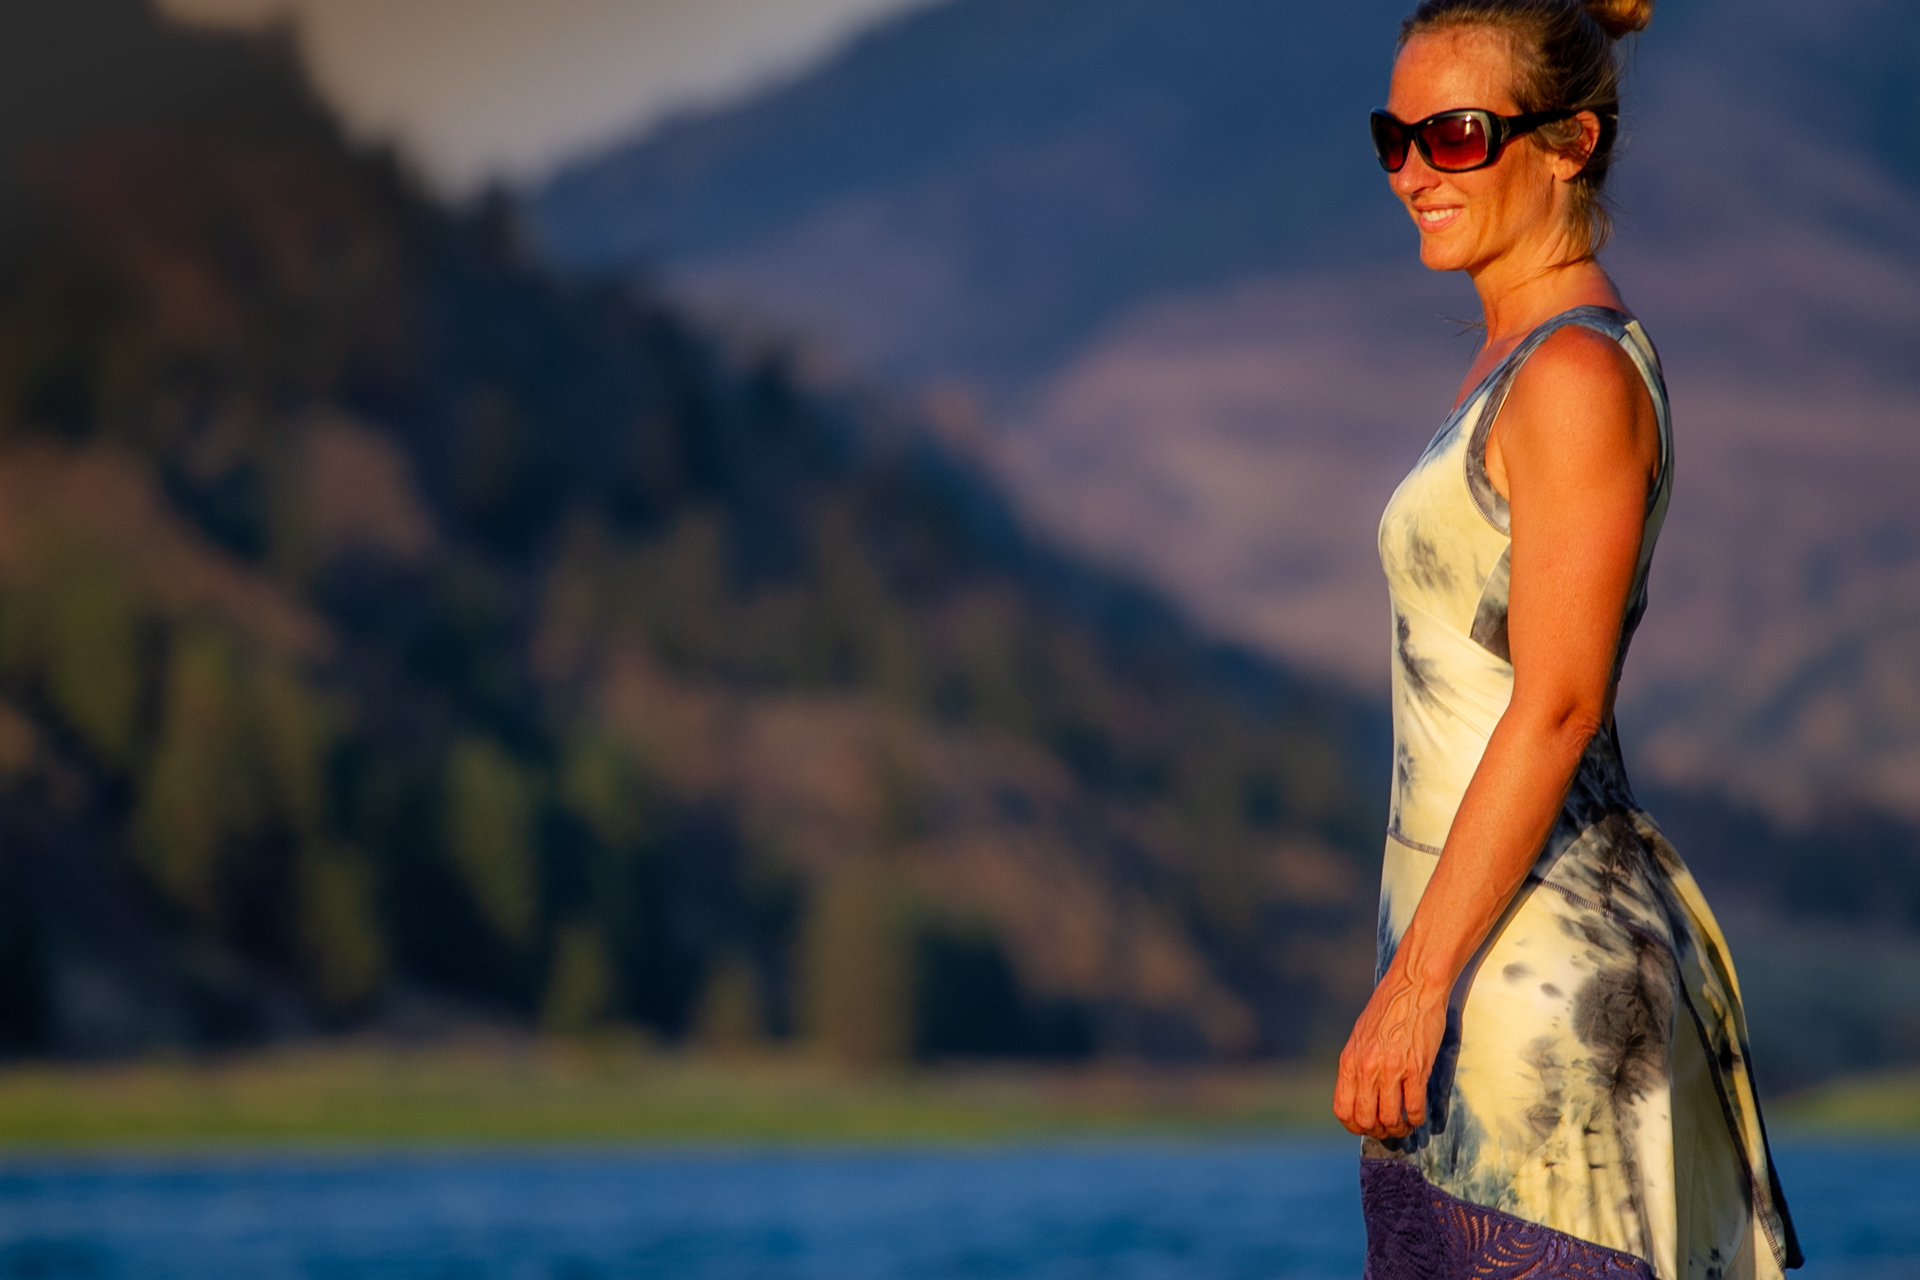 Fashion Designer Autumn Teneyl wearing a boho dress in the mountains.